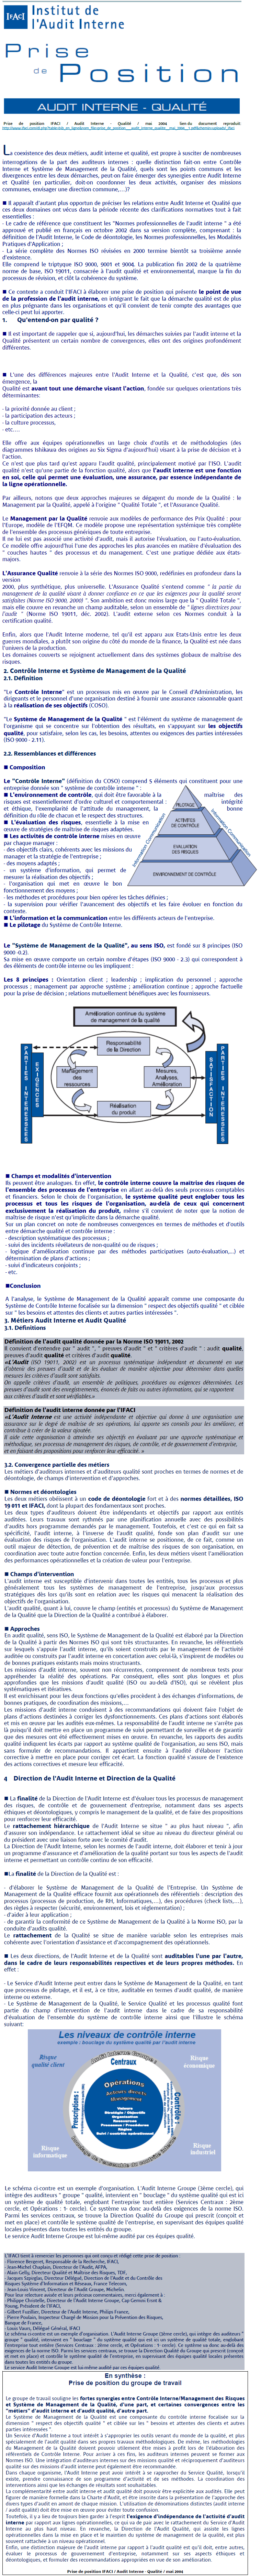 IFACI - PRISE DE POSITION – AUDIT INTERNE –QUALITE – MAI 2004